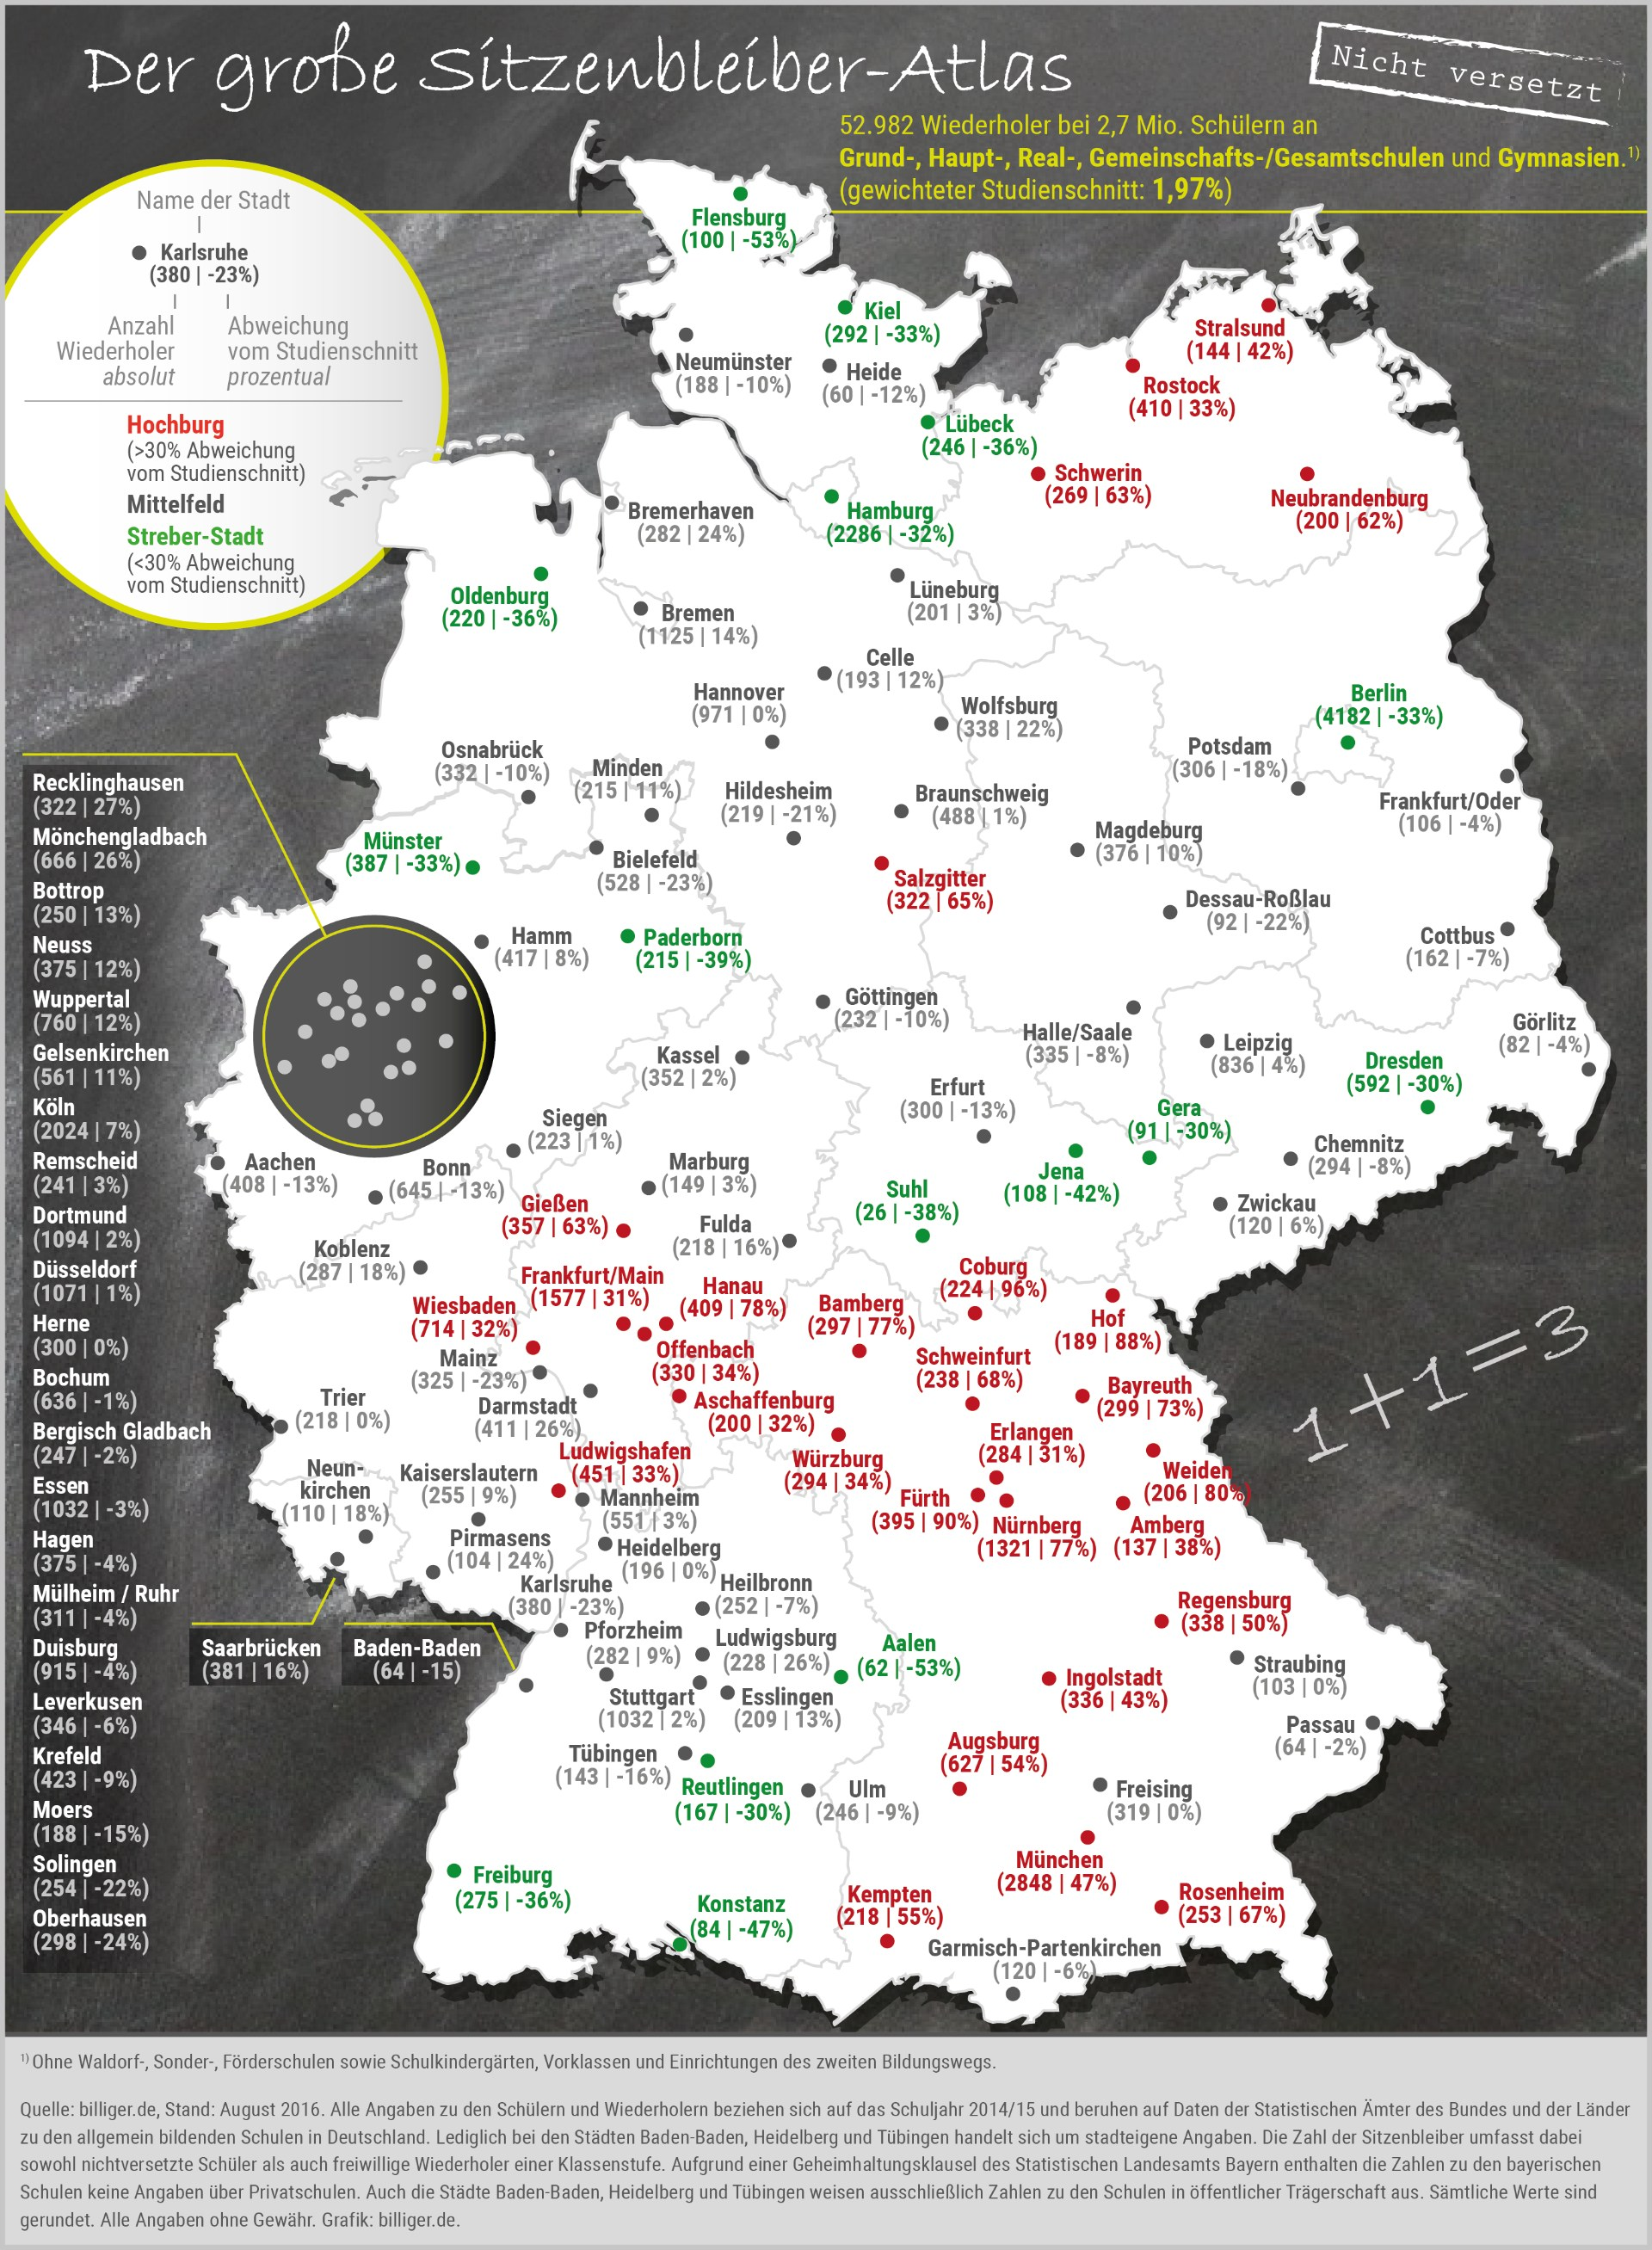 infografik-billiger-de-sitzenbleiber-staedte-altlas